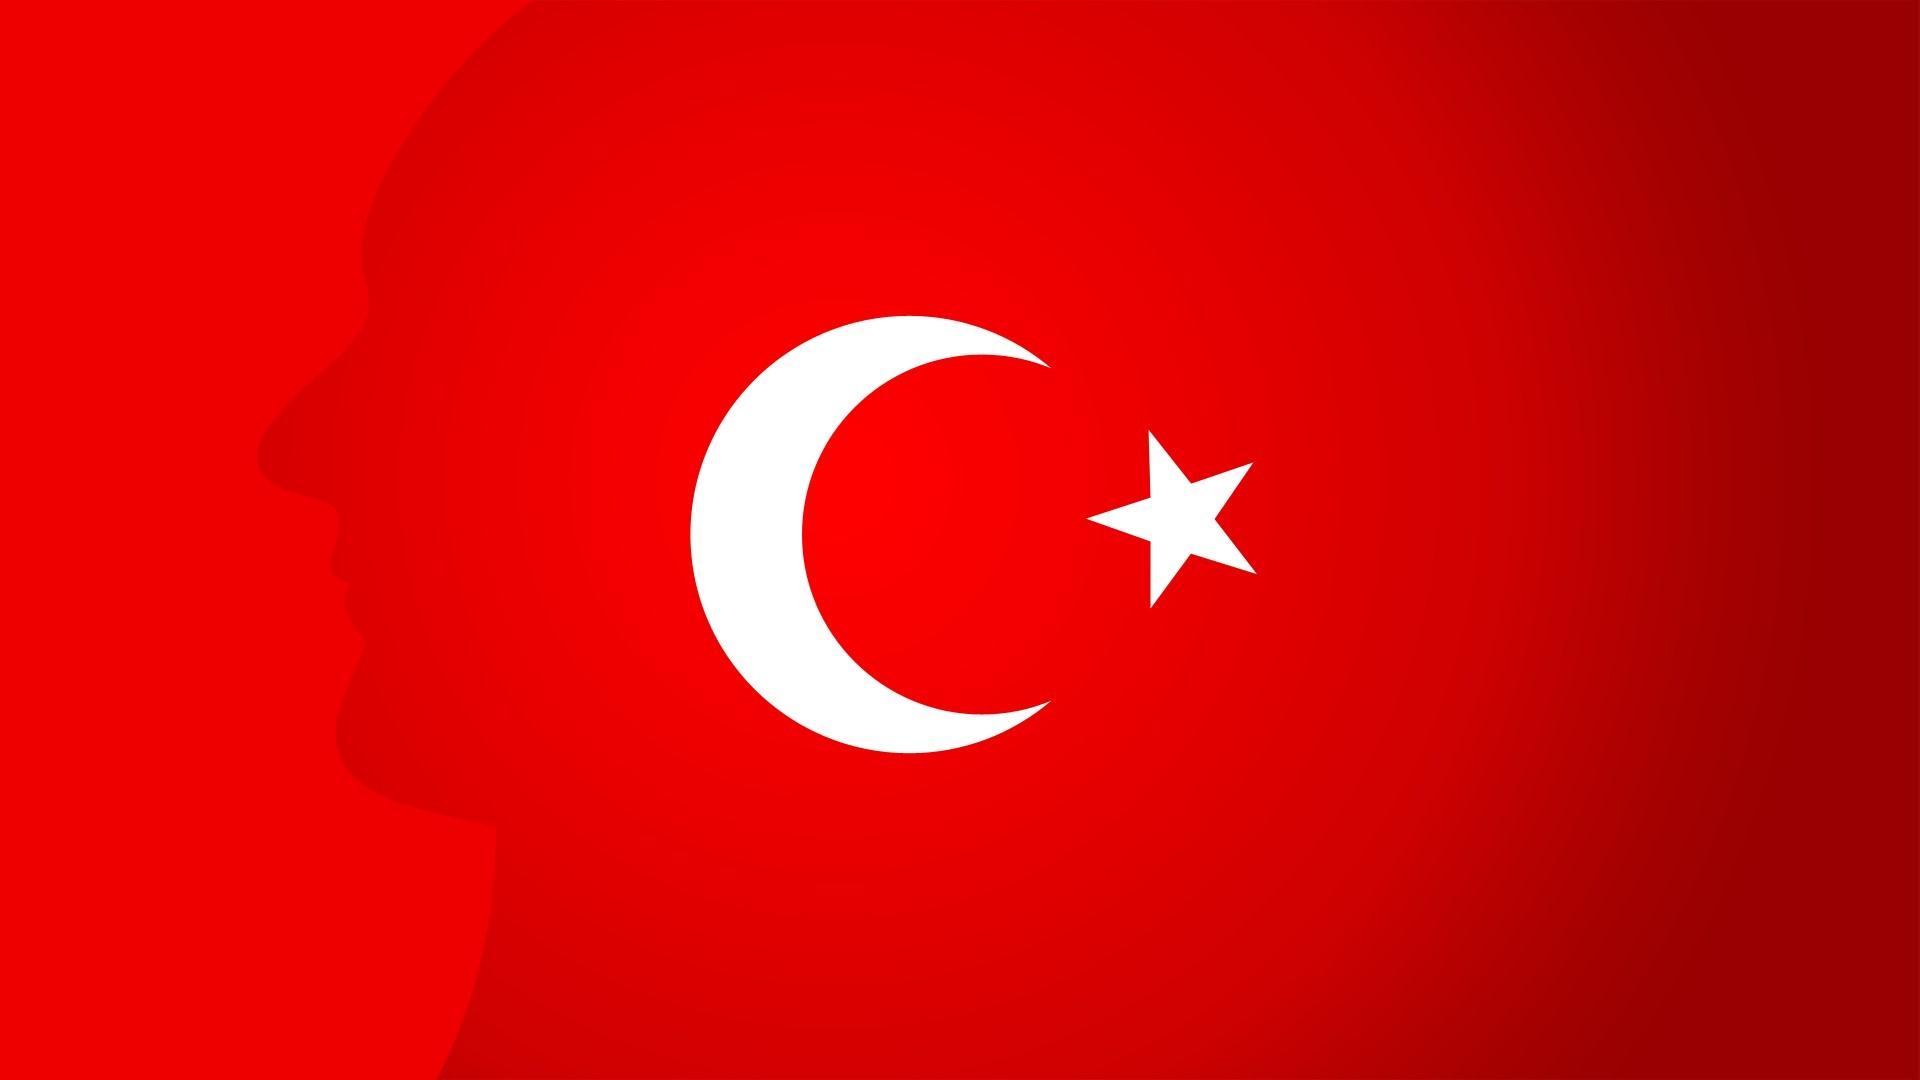 turk-bayragi-buyuk-boy-duvar-kagidi